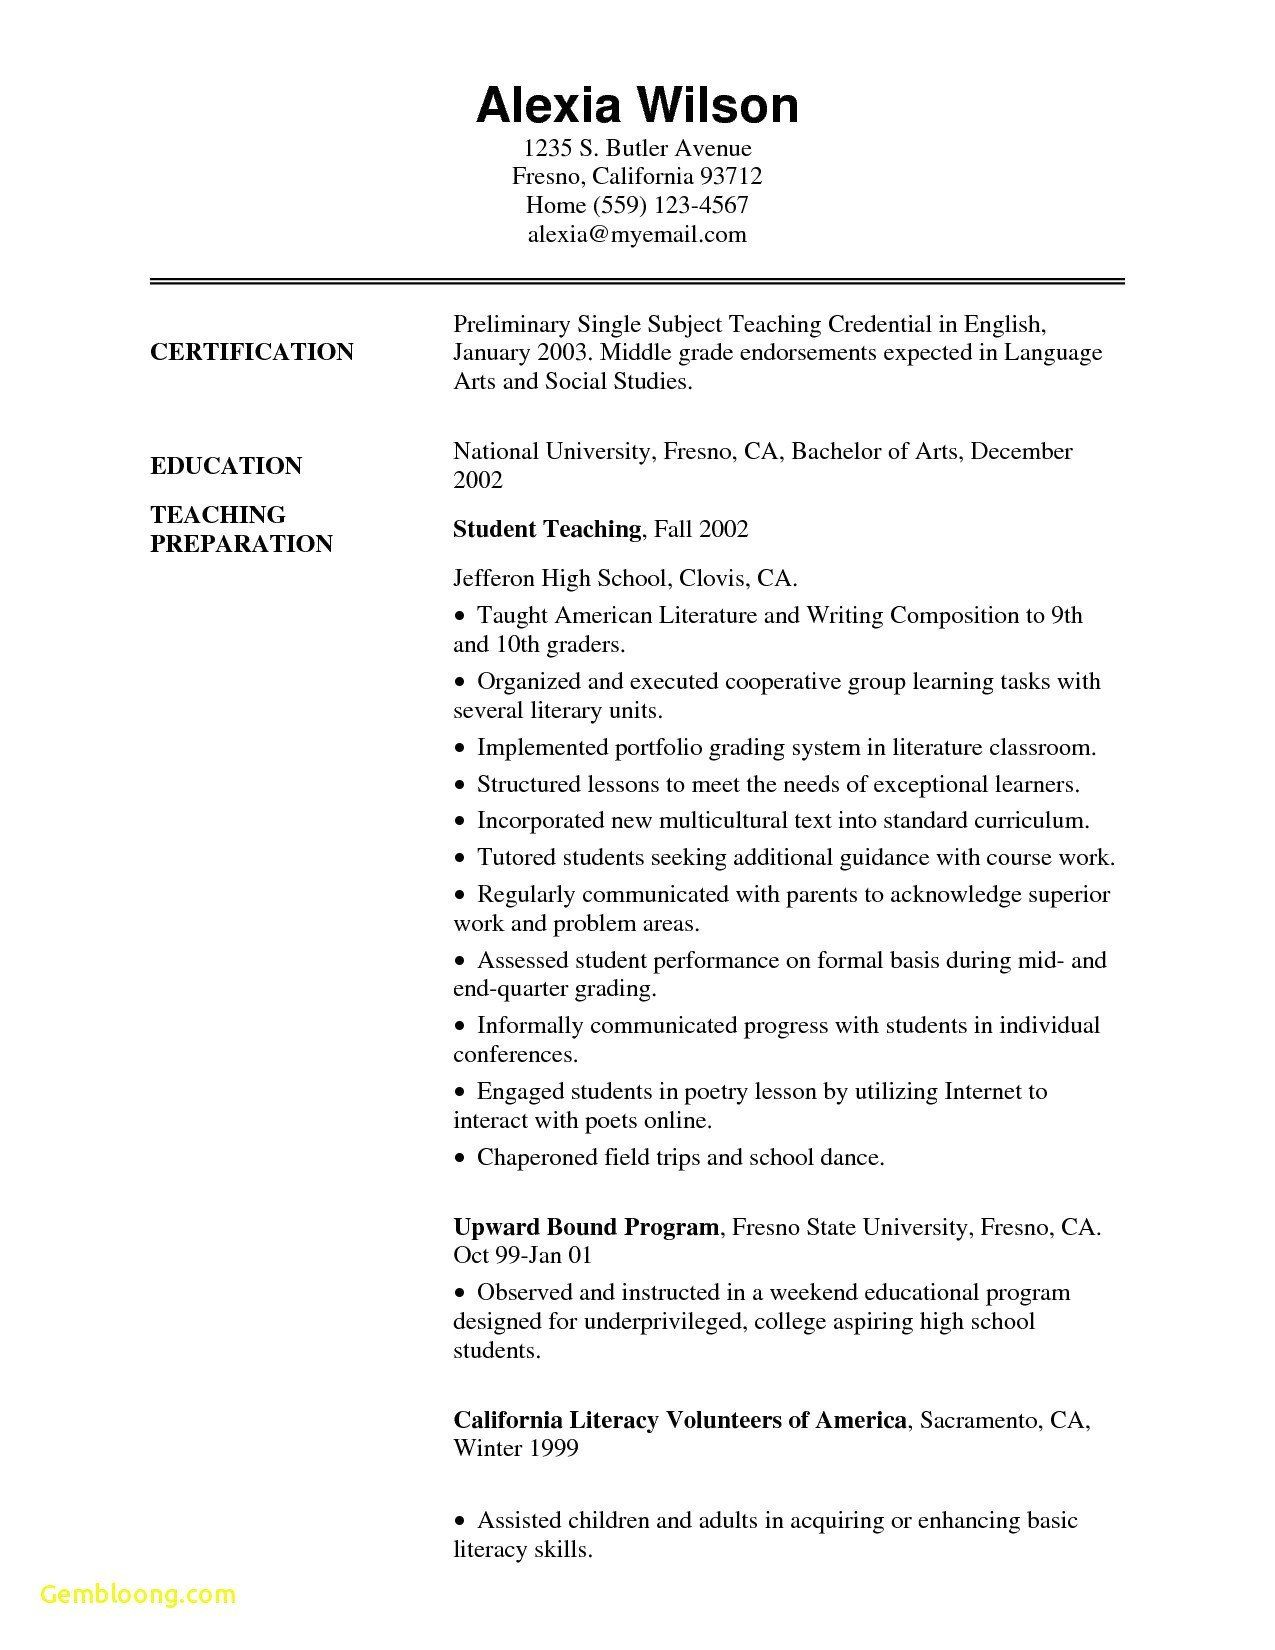 Adding Resume To Linkedin Beautiful Adding Linkedin Profile To Resume Teacher Resume Template Teacher Resume Teaching Credential